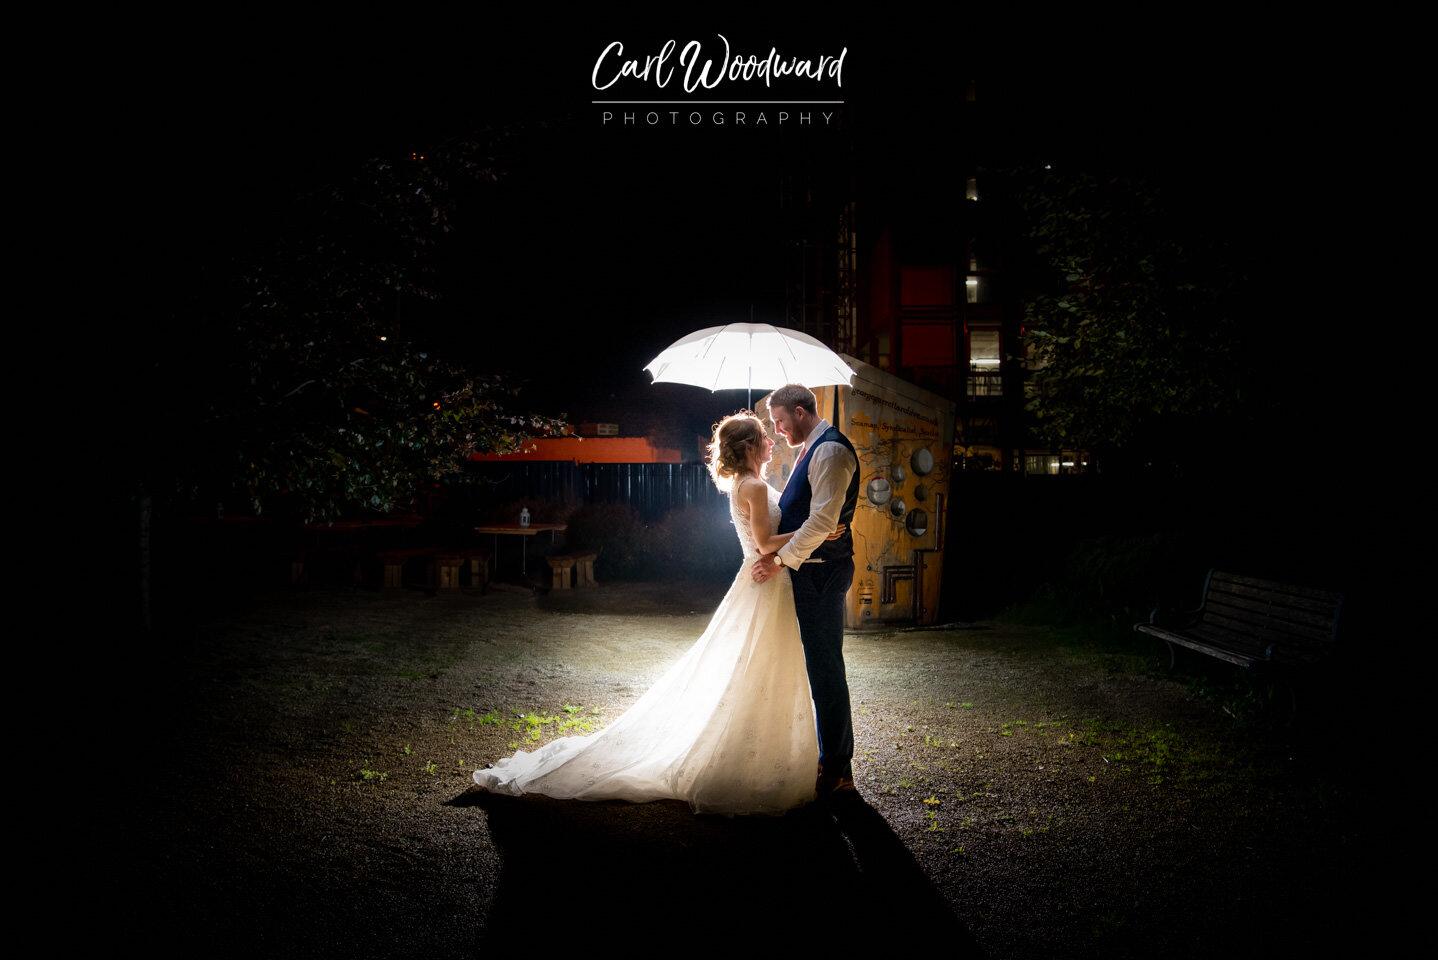 020-Siren-Liverpool-Wedding-Photos.jpg